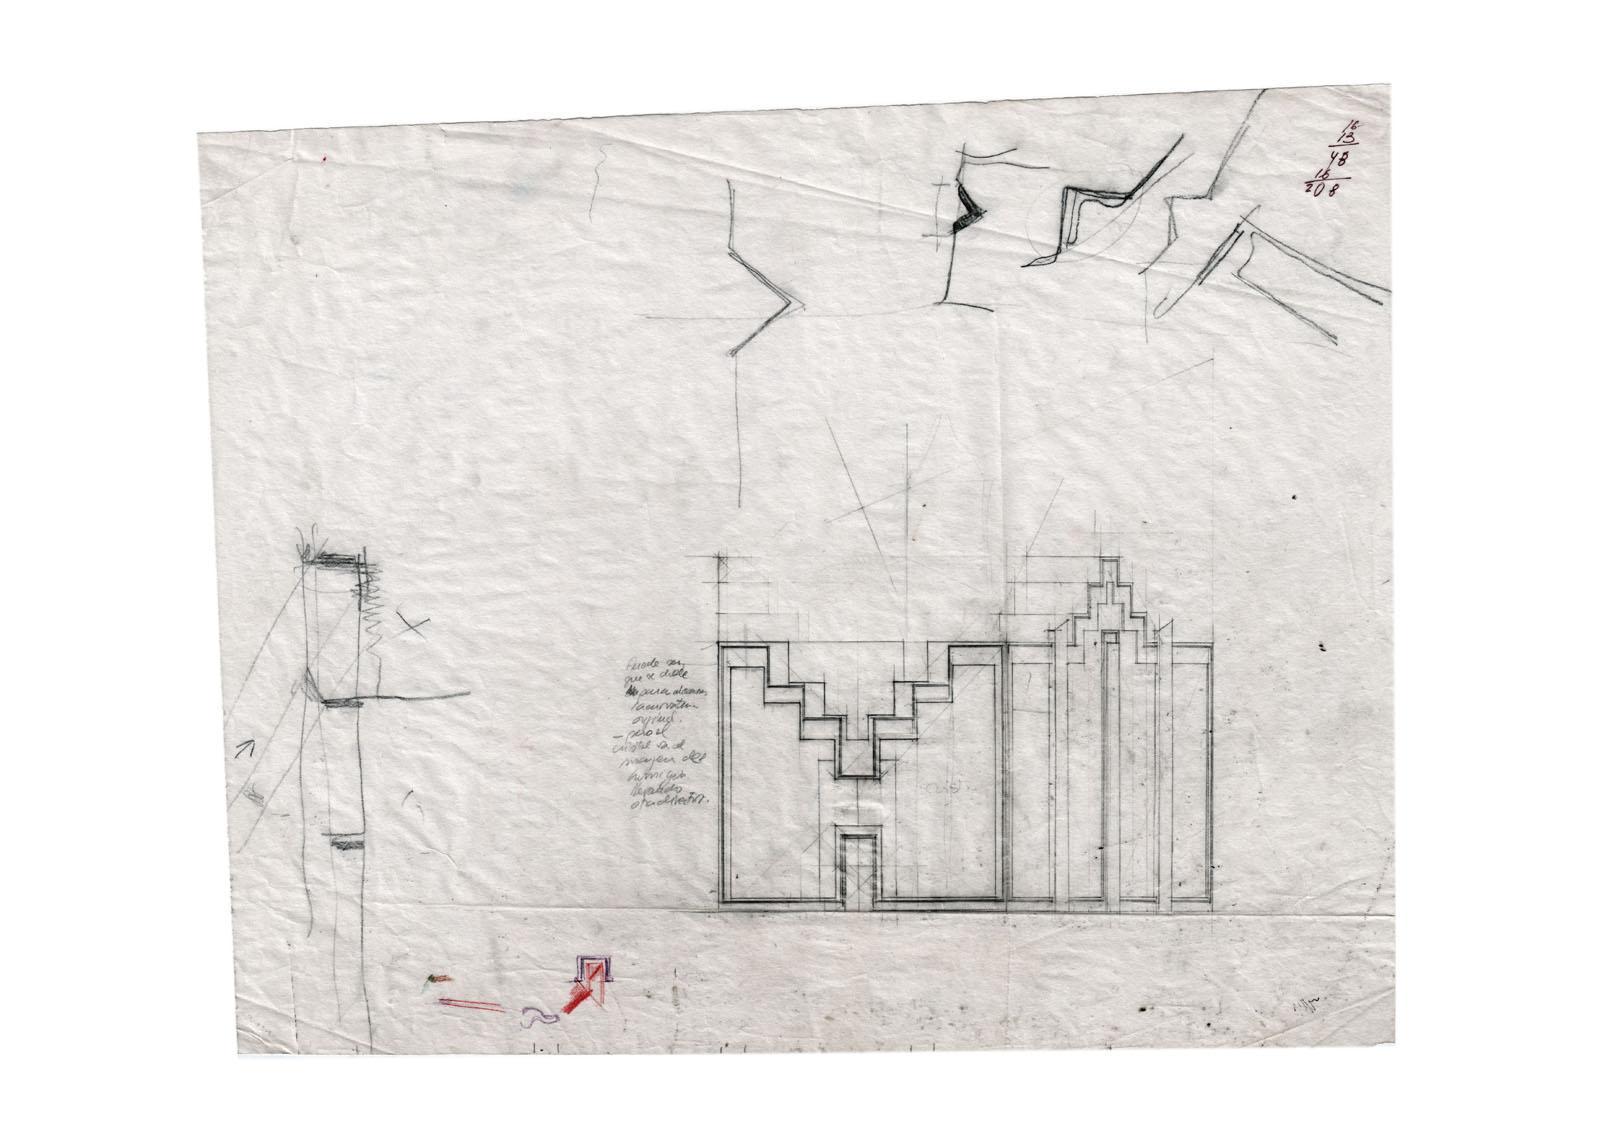 danielvillalobos-architecturexxthcentury-spanisharchitecture-schoolarchitectureproject-12